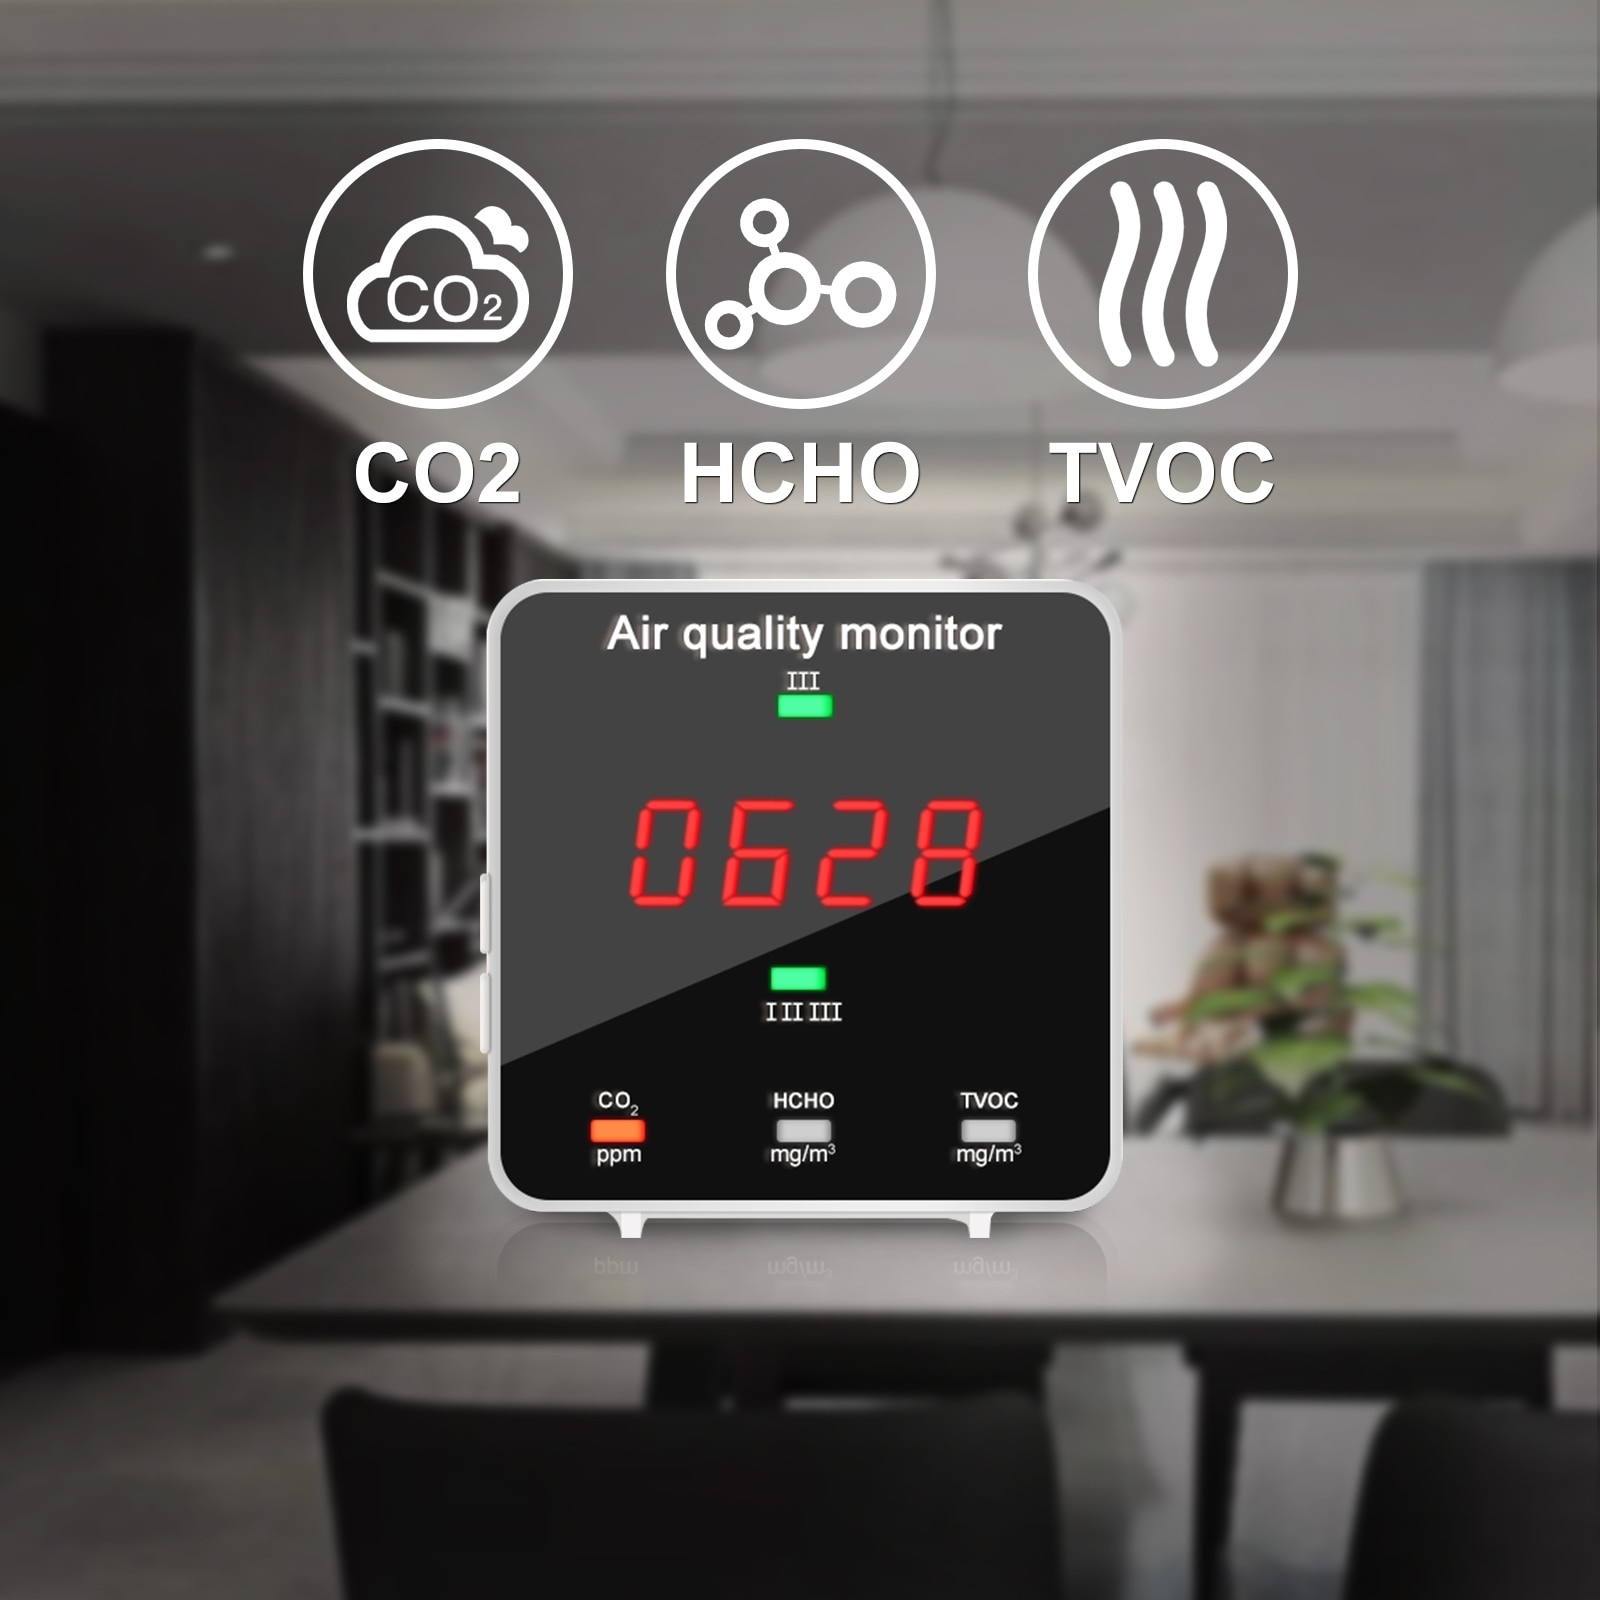 co2 meter digital temperature humidity sensor tester air quality monitor carbon dioxide tvoc formaldehyde hcho gas detector CO2 Meter Digital Temperature Humidity Sensor Tester Air Quality Monitor Carbon Dioxide TVOC Formaldehyde HCHO Detector